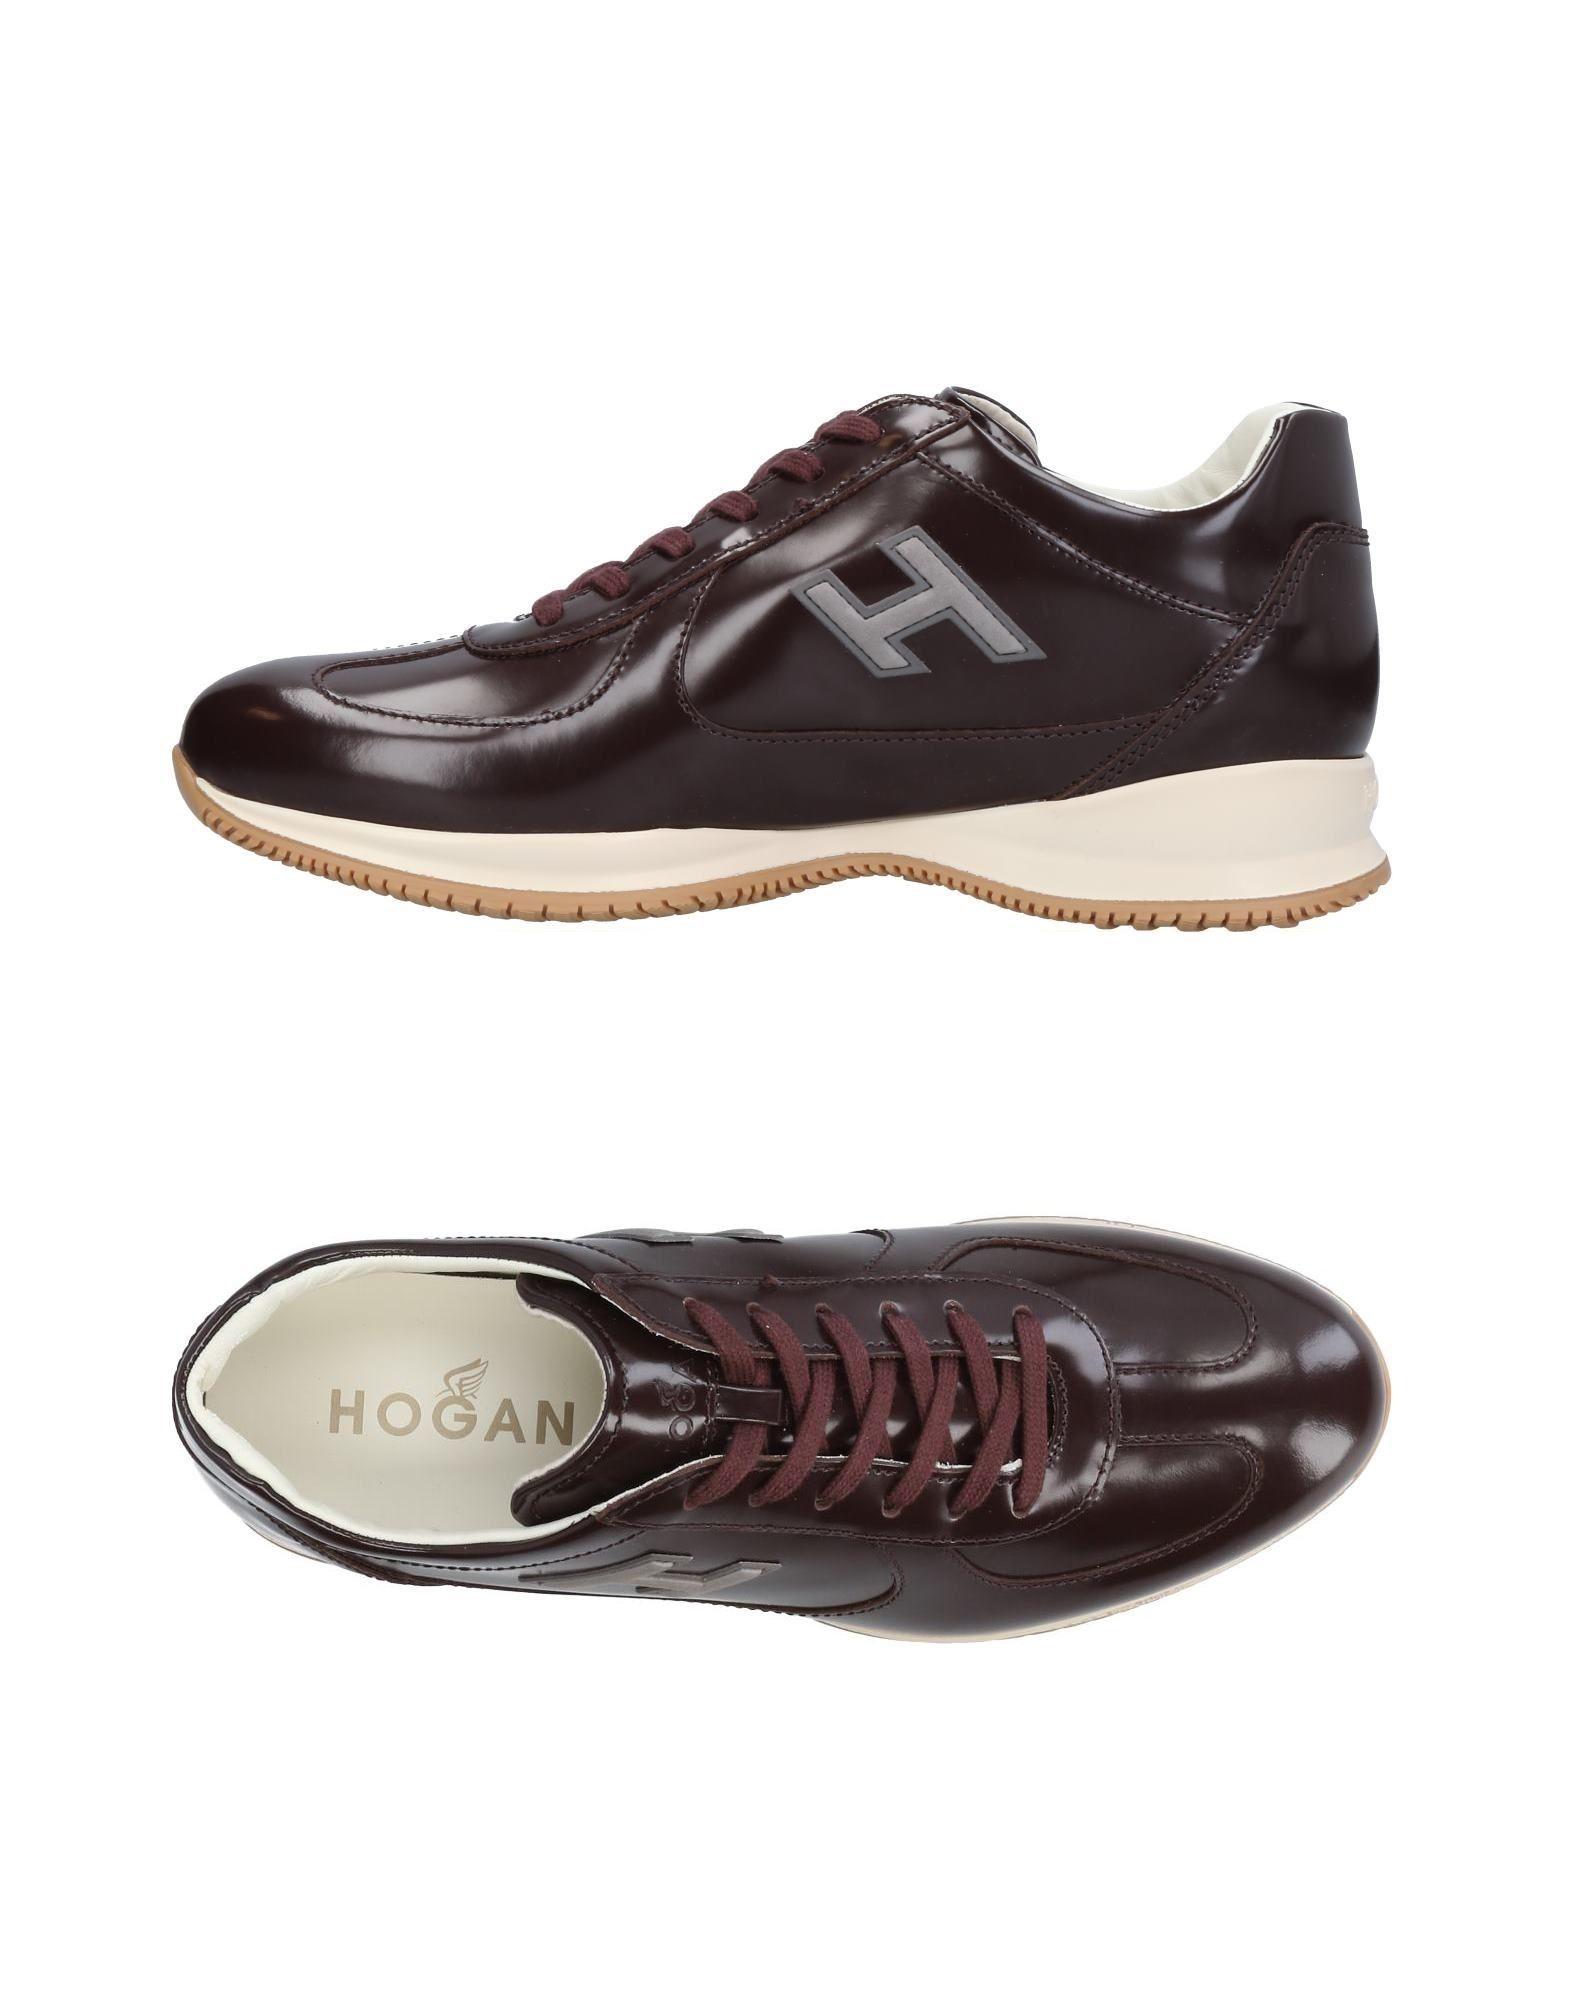 Hogan Sneakers Herren  11435529QW Gute Qualität beliebte Schuhe